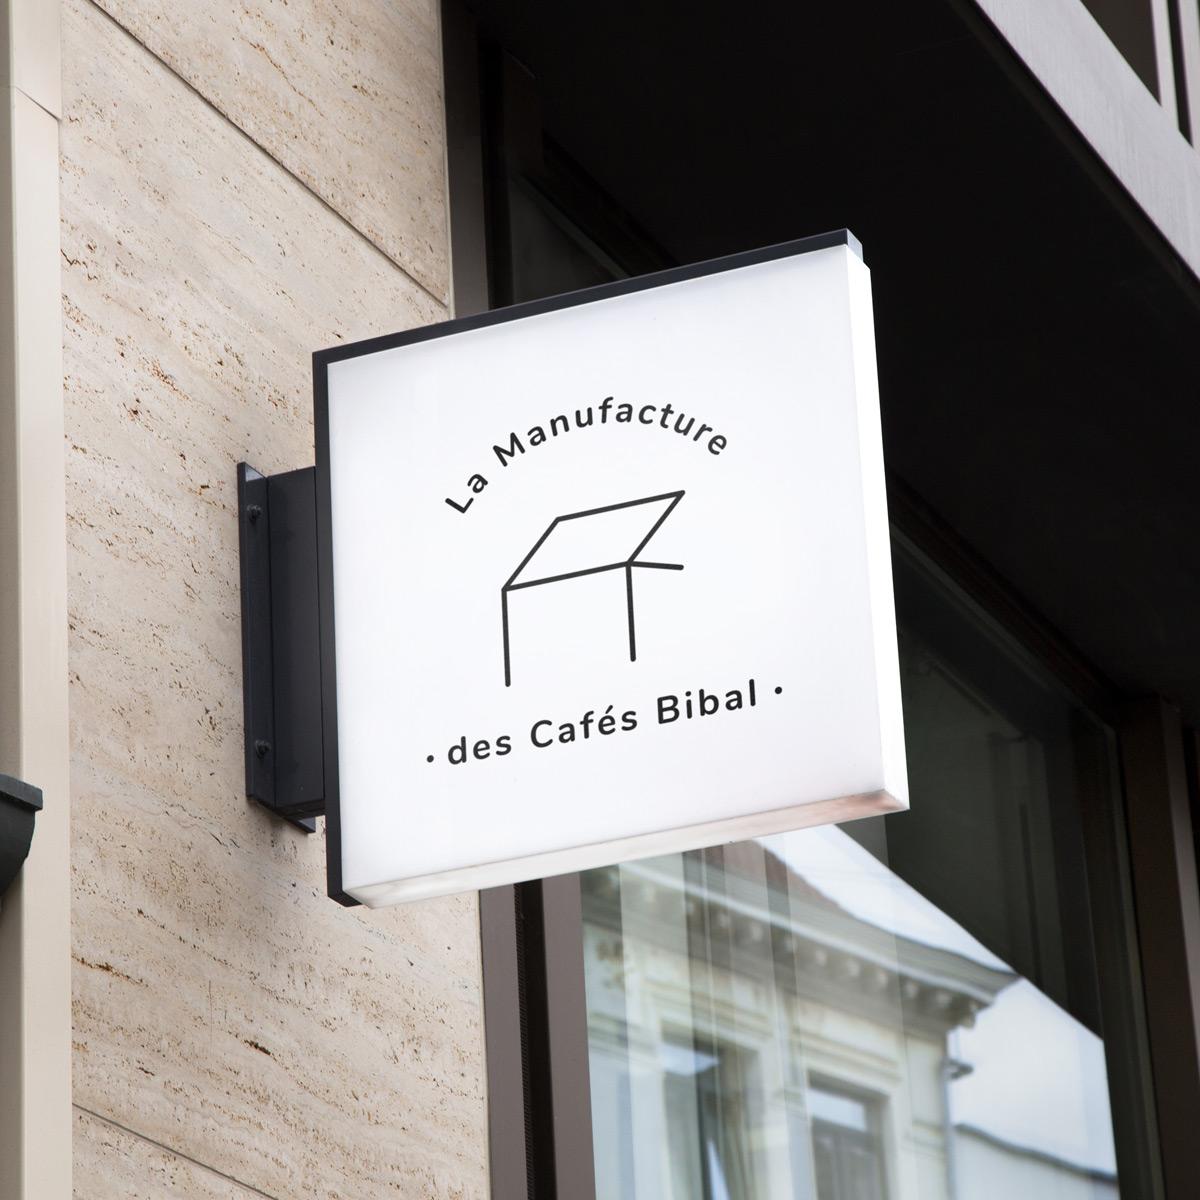 https://isse-ari-design.fr/wp-content/uploads/2020/08/enseigne-cafes-bibal.jpg